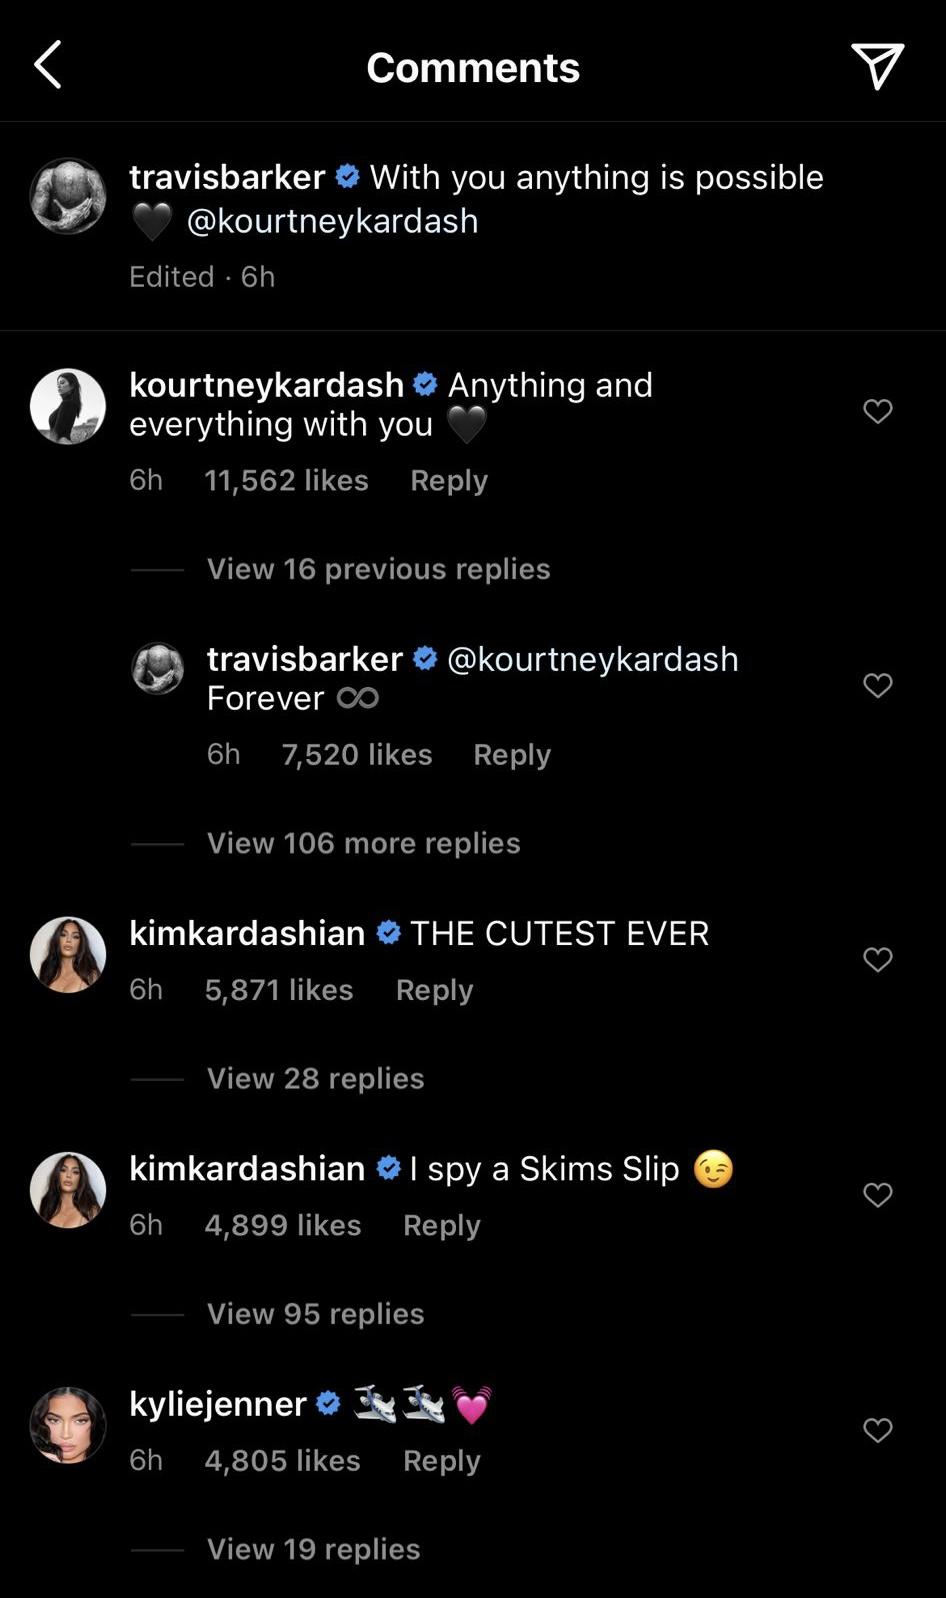 Travis Barker Kourtney Kardashian